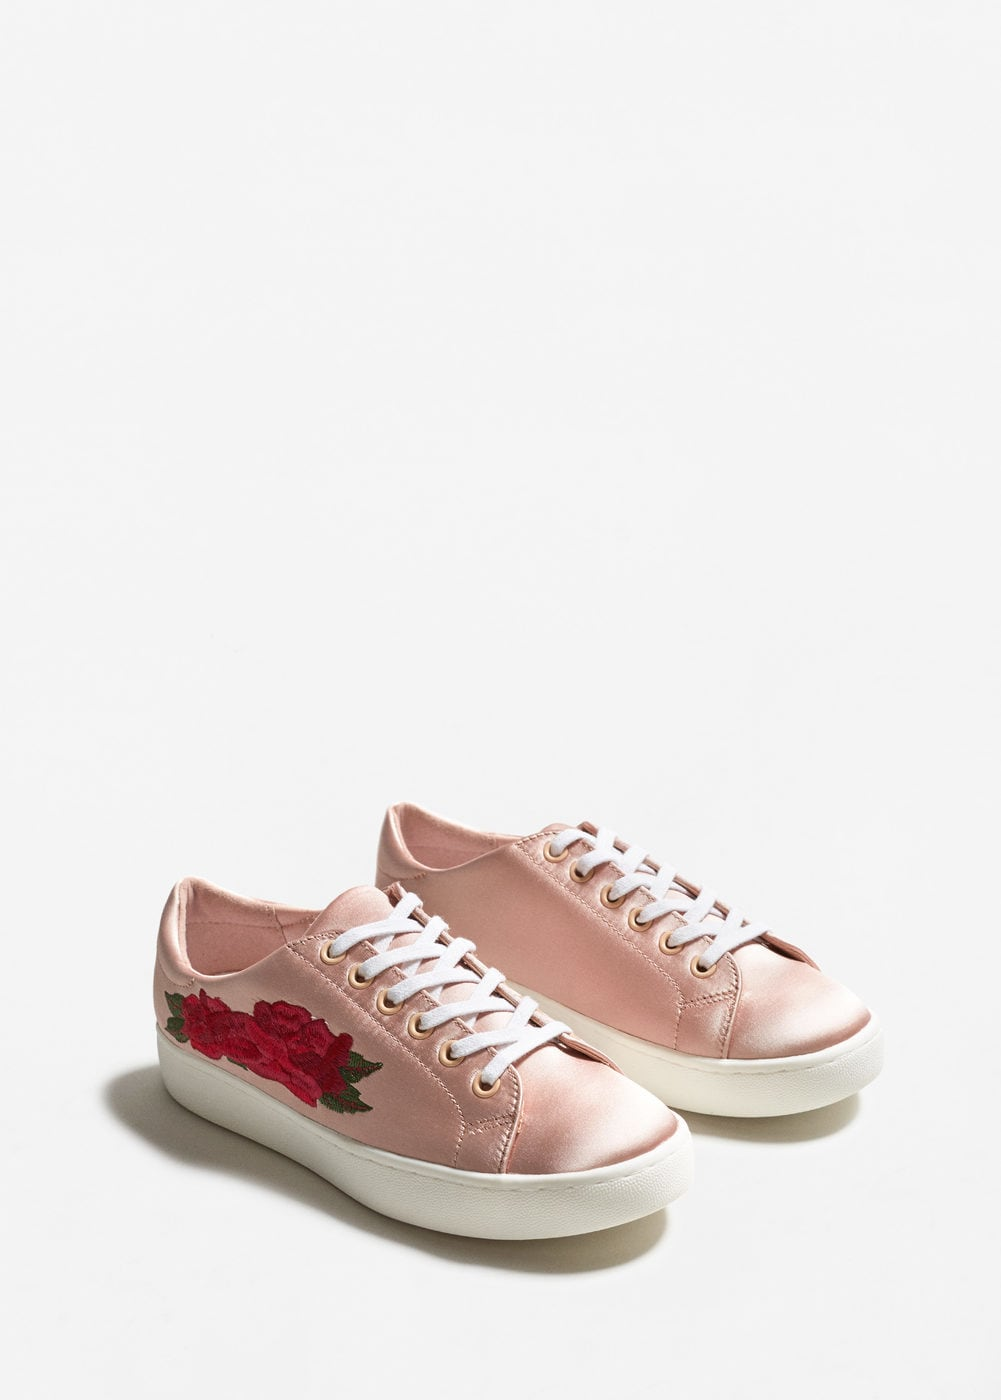 <a href='https://shop.mango.com/hu-en/women/shoes-sneakers/satined-embroidery-sneaker₁3093025.html?c=80&n=1&s=accesorios.accesorio;42,342,442.zapatos42,342,442;Deportivas' target='_blank' rel='noopener noreferrer'>Mango</a></p>